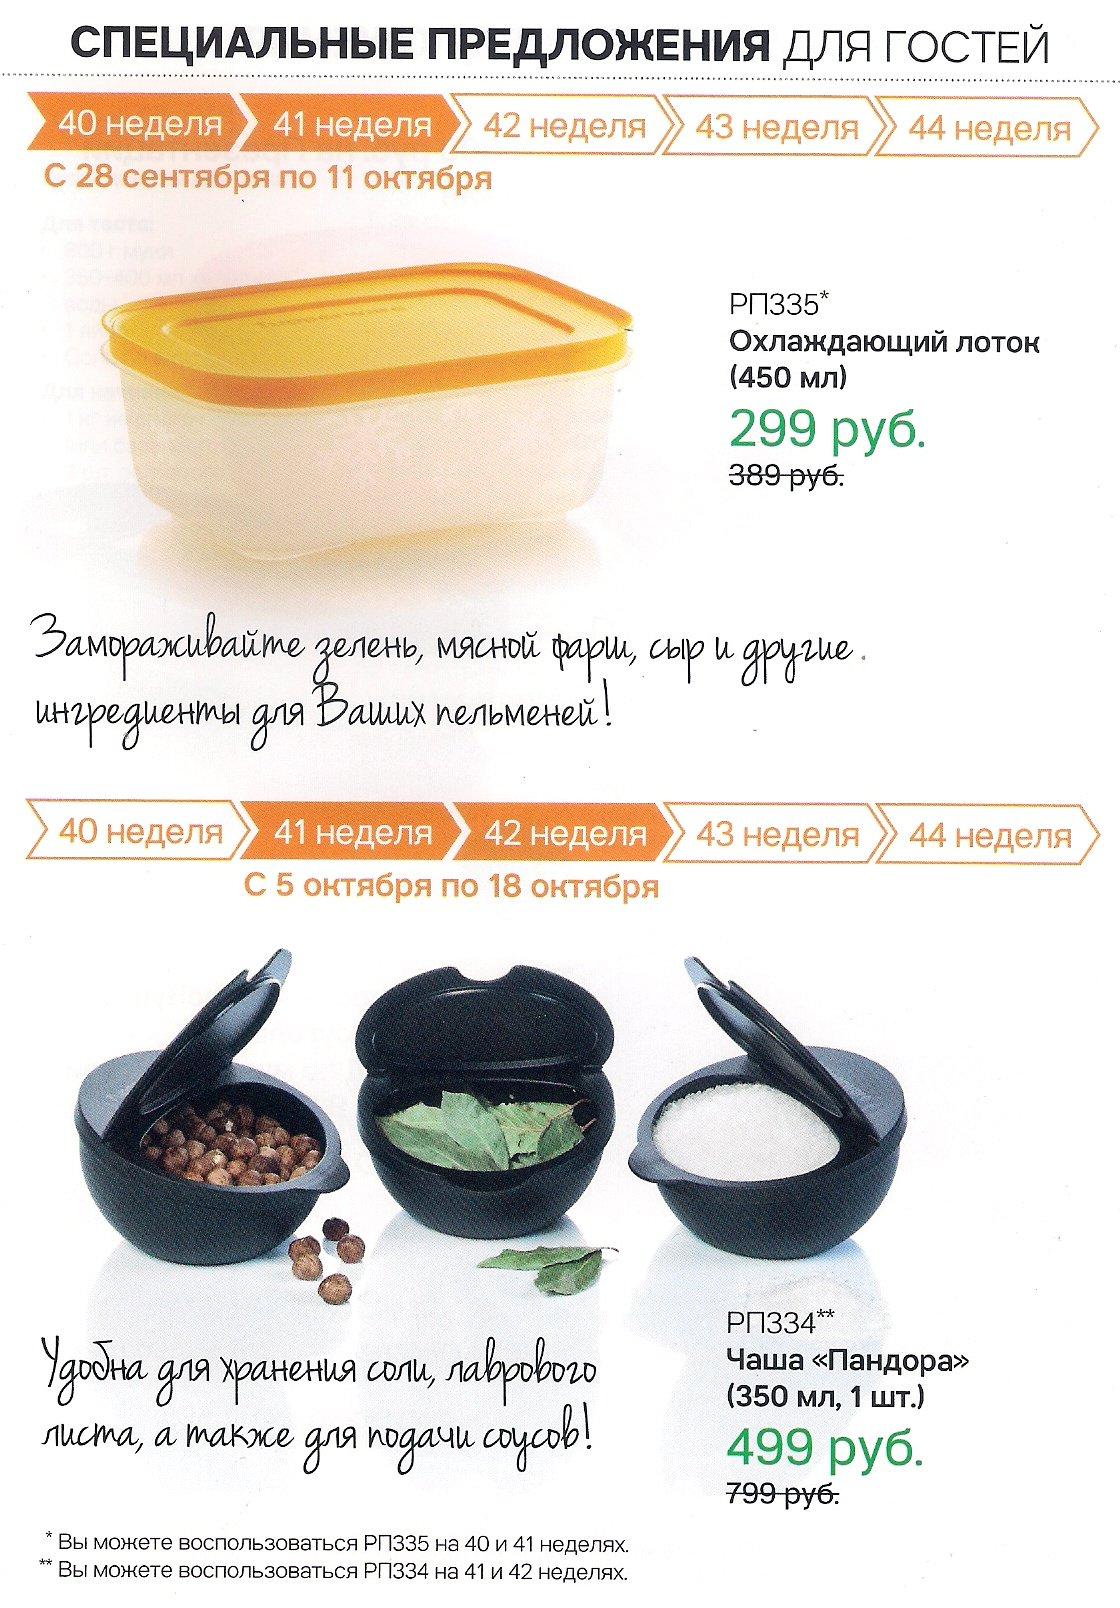 https://tupperware-online.ru/images/upload/12d.jpg